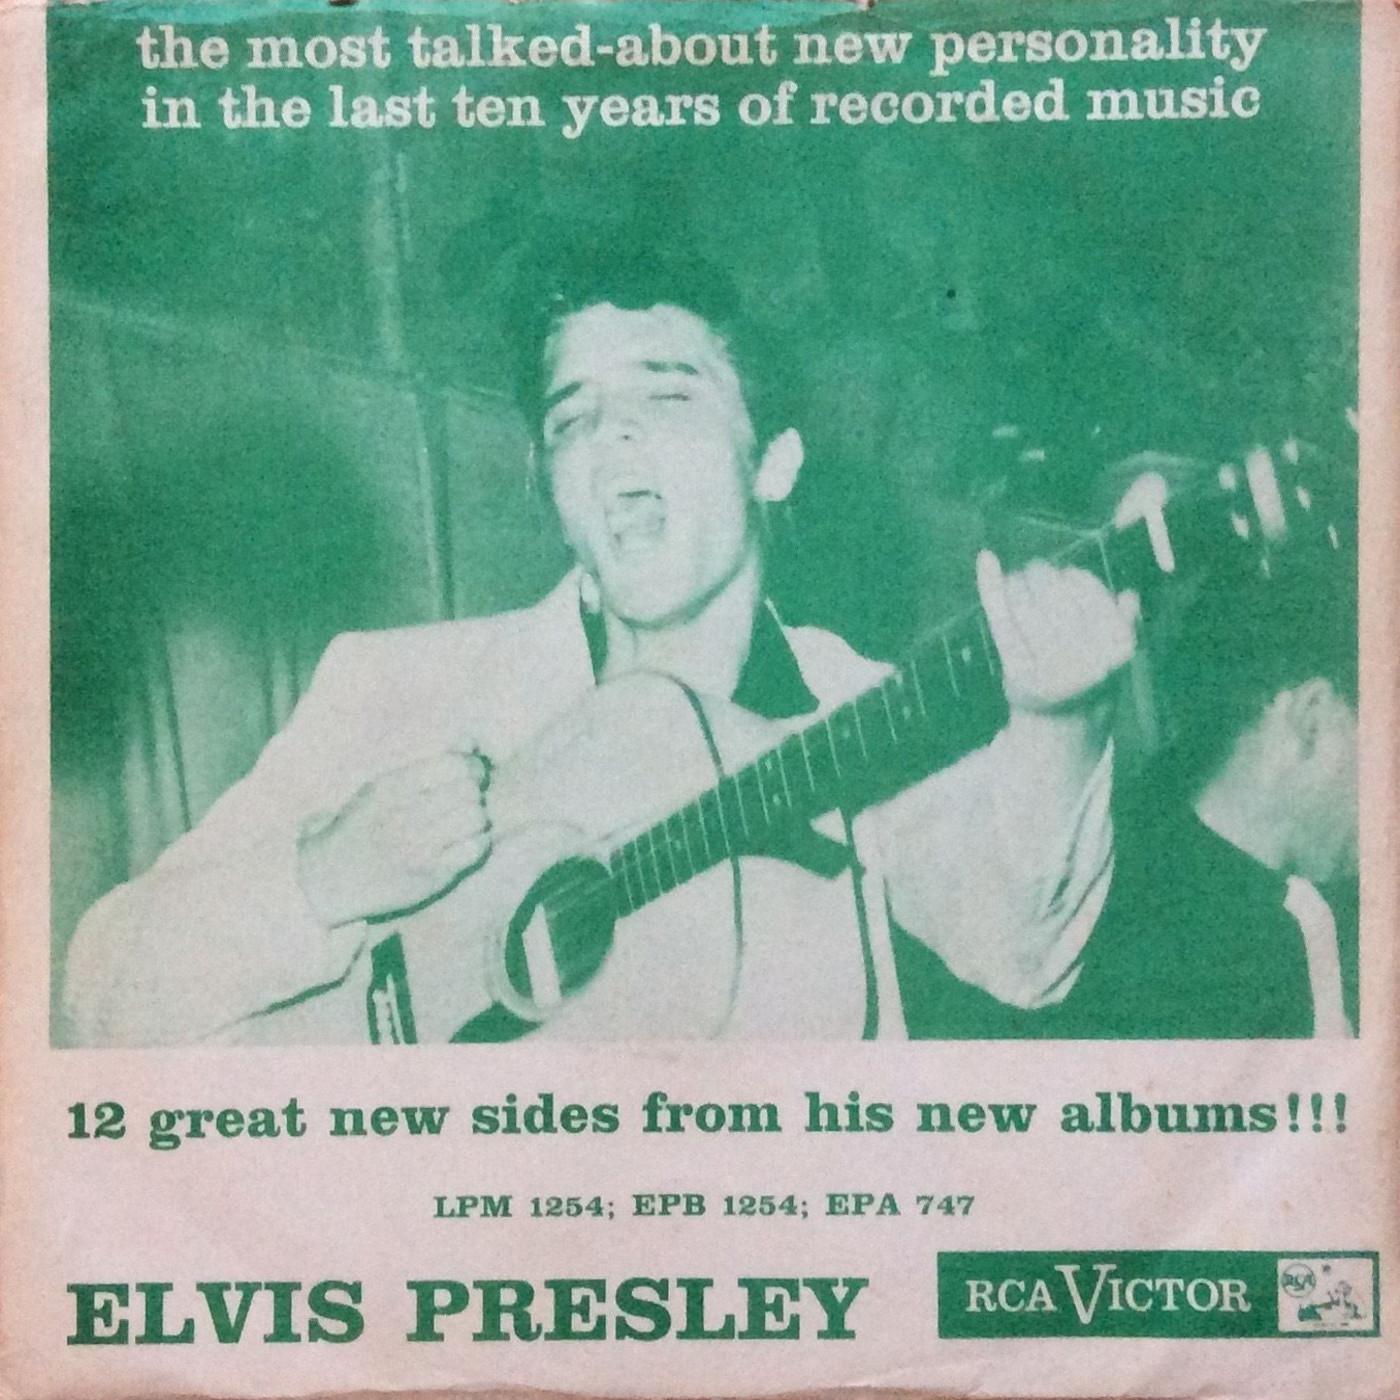 Presley - ELVIS PRESLEY Epb1254a0lxnx